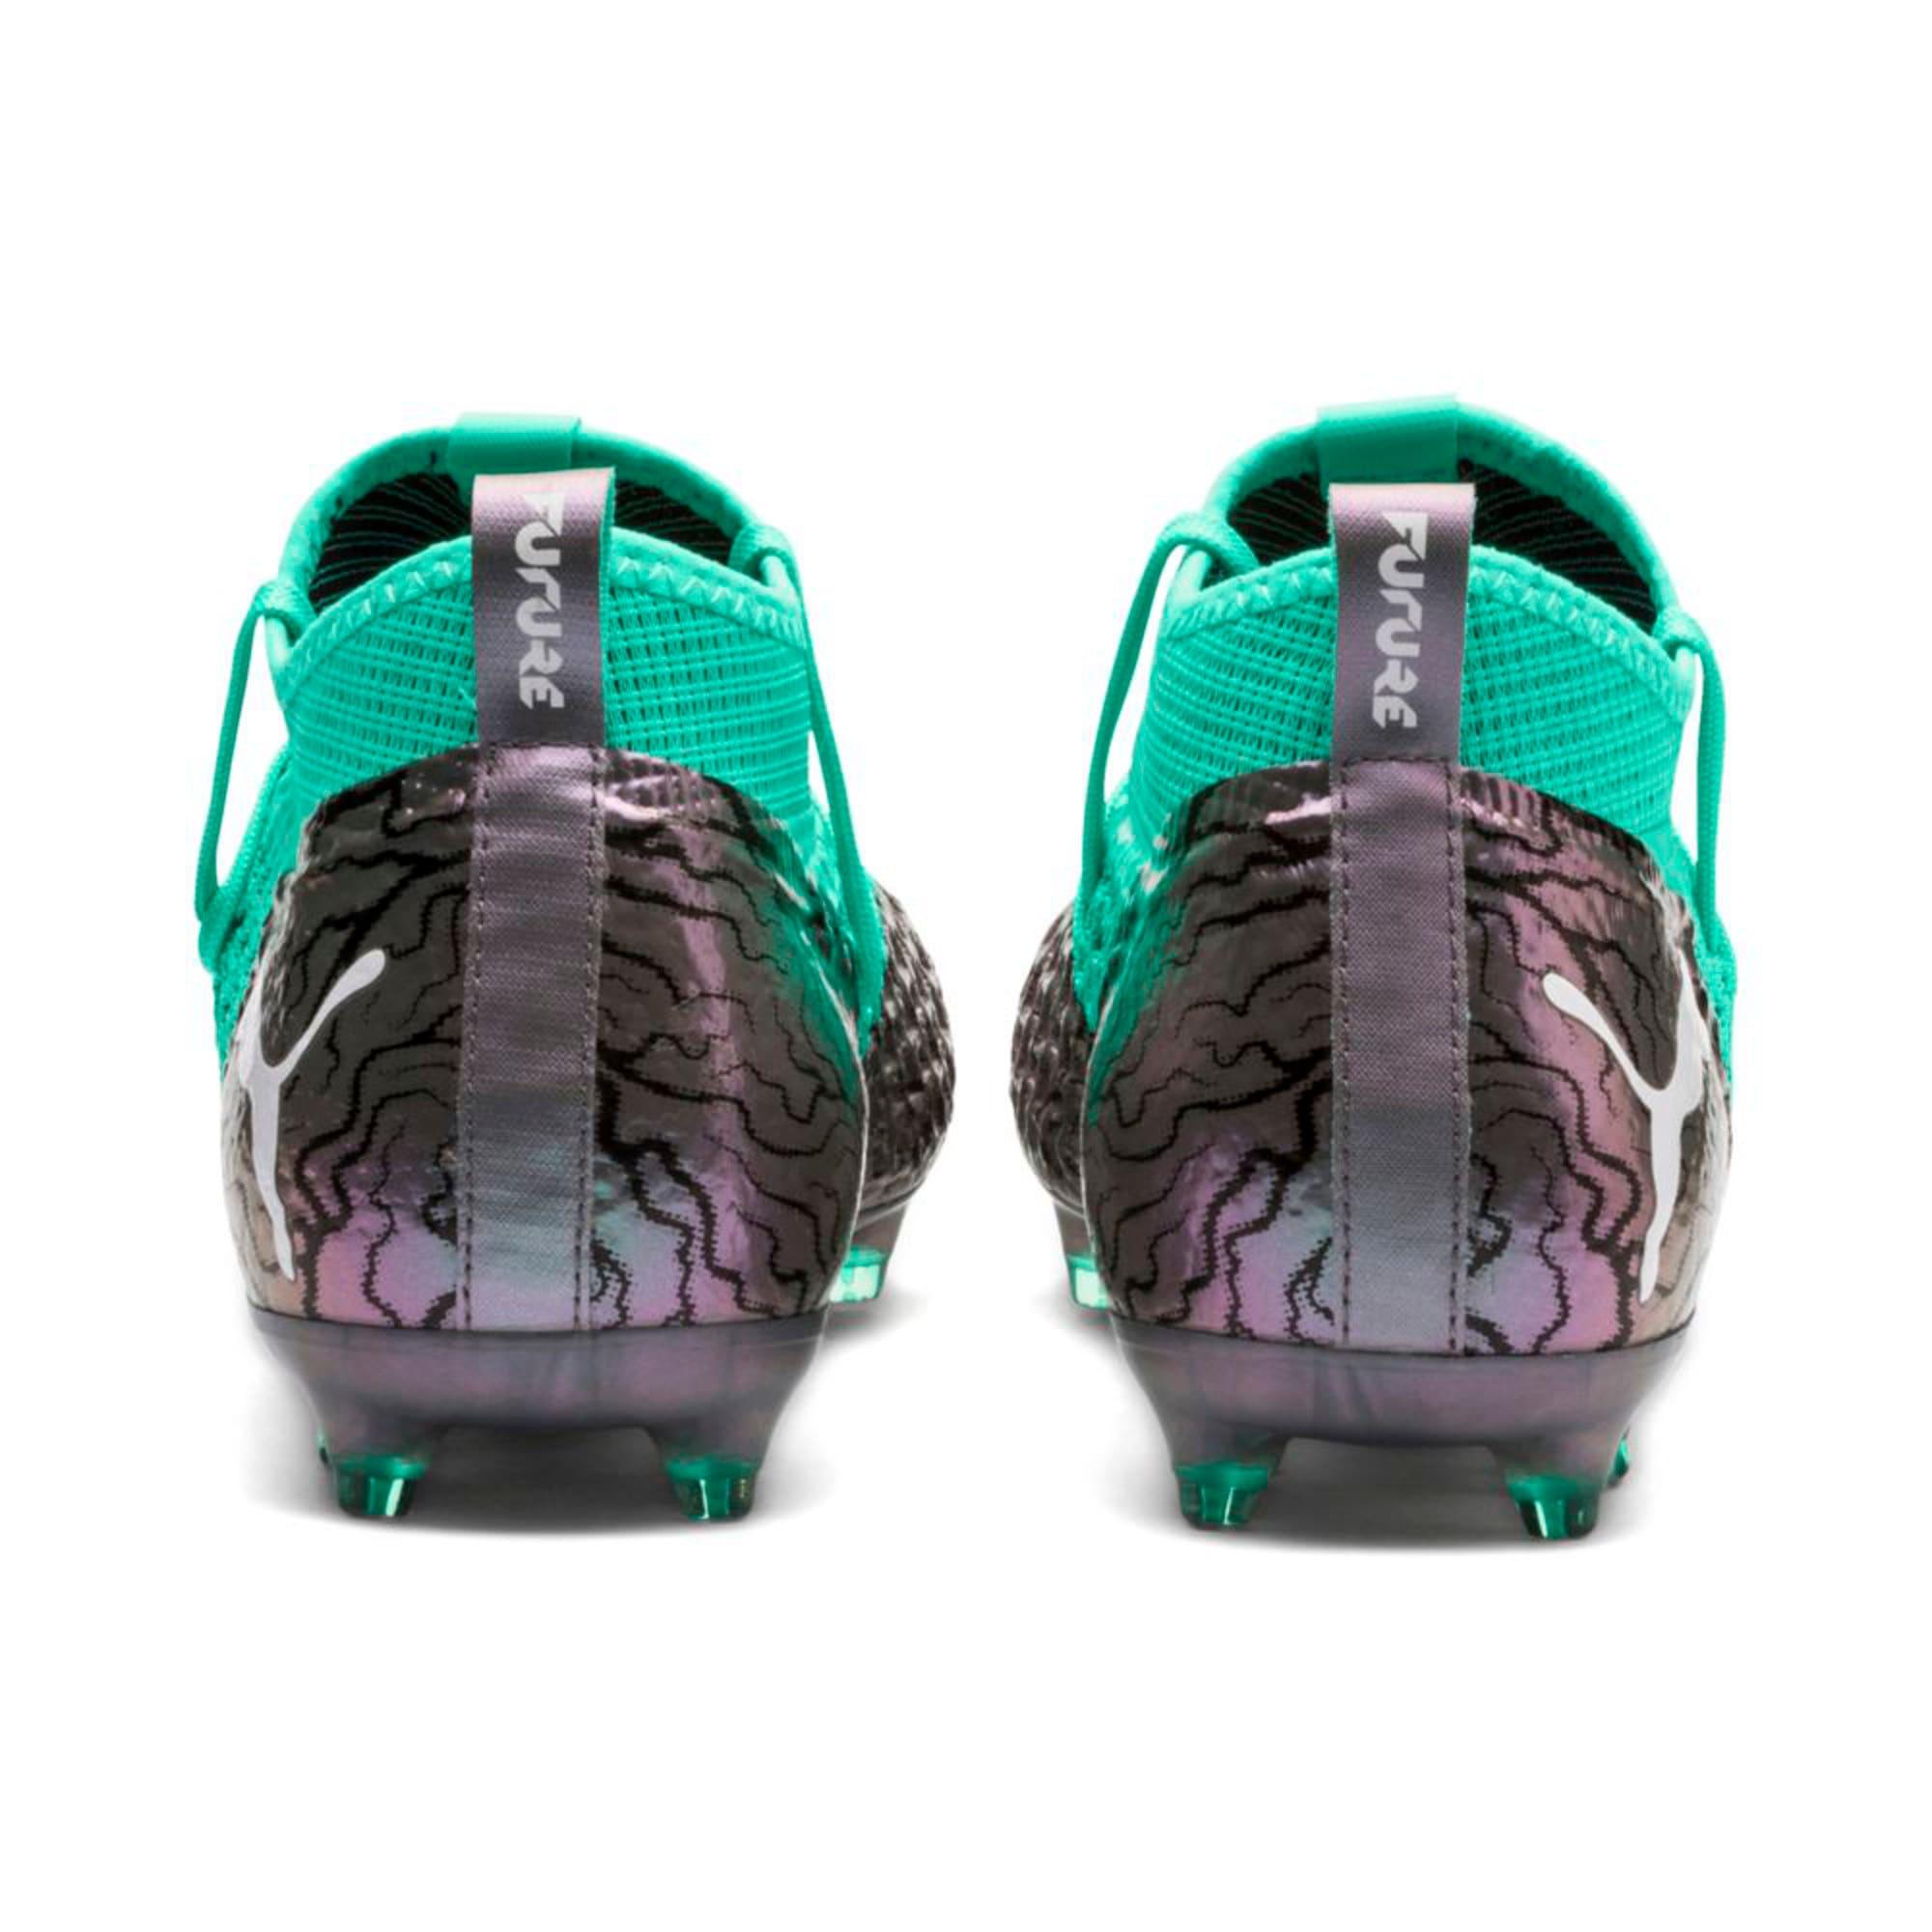 Thumbnail 3 of FUTURE 2.2 NETFIT FG/AG  Football Boots, Col Shift-Green-White-Black, medium-IND